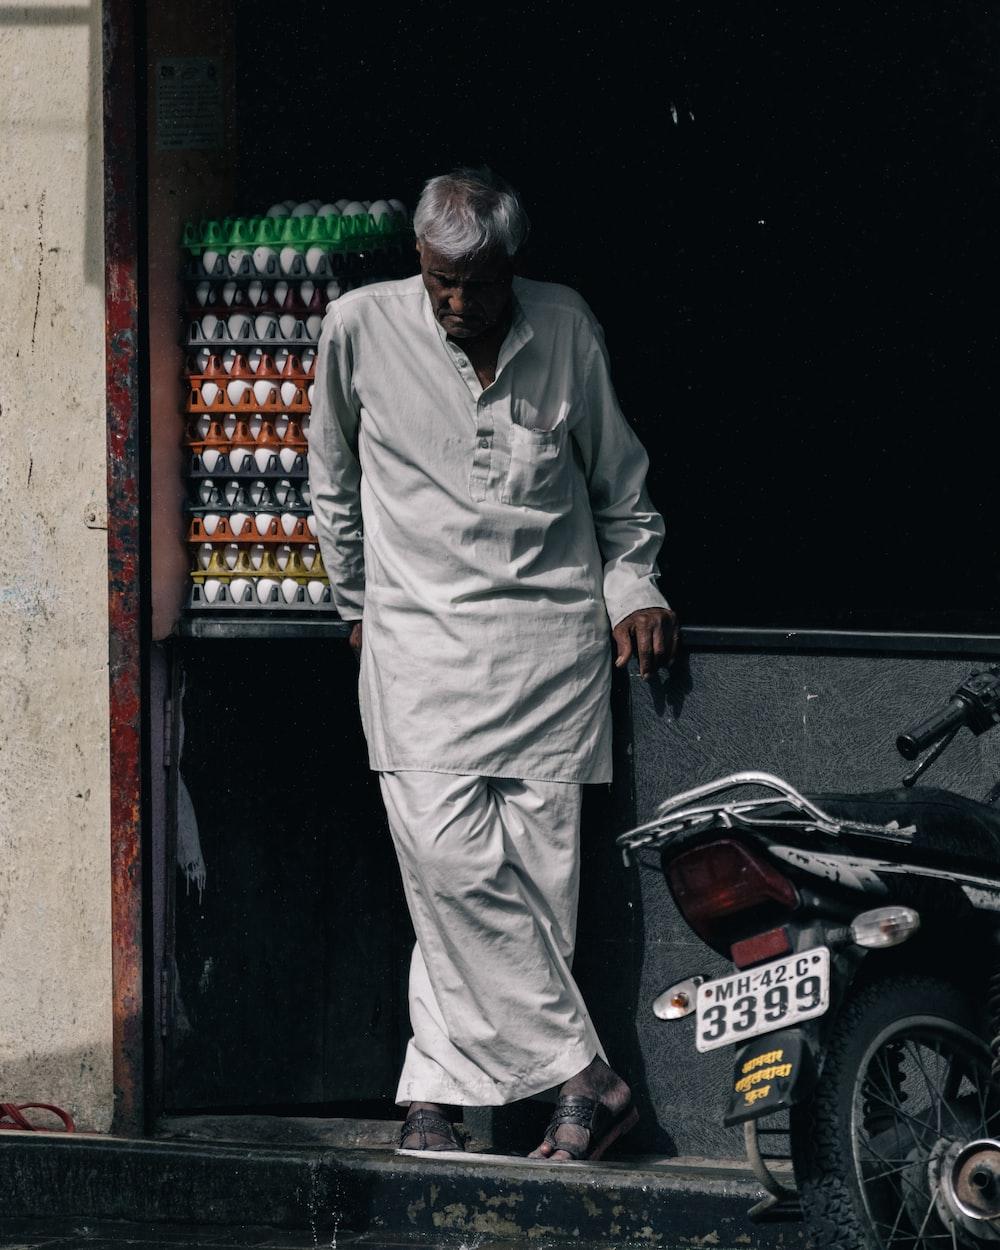 man standing near motorcycle